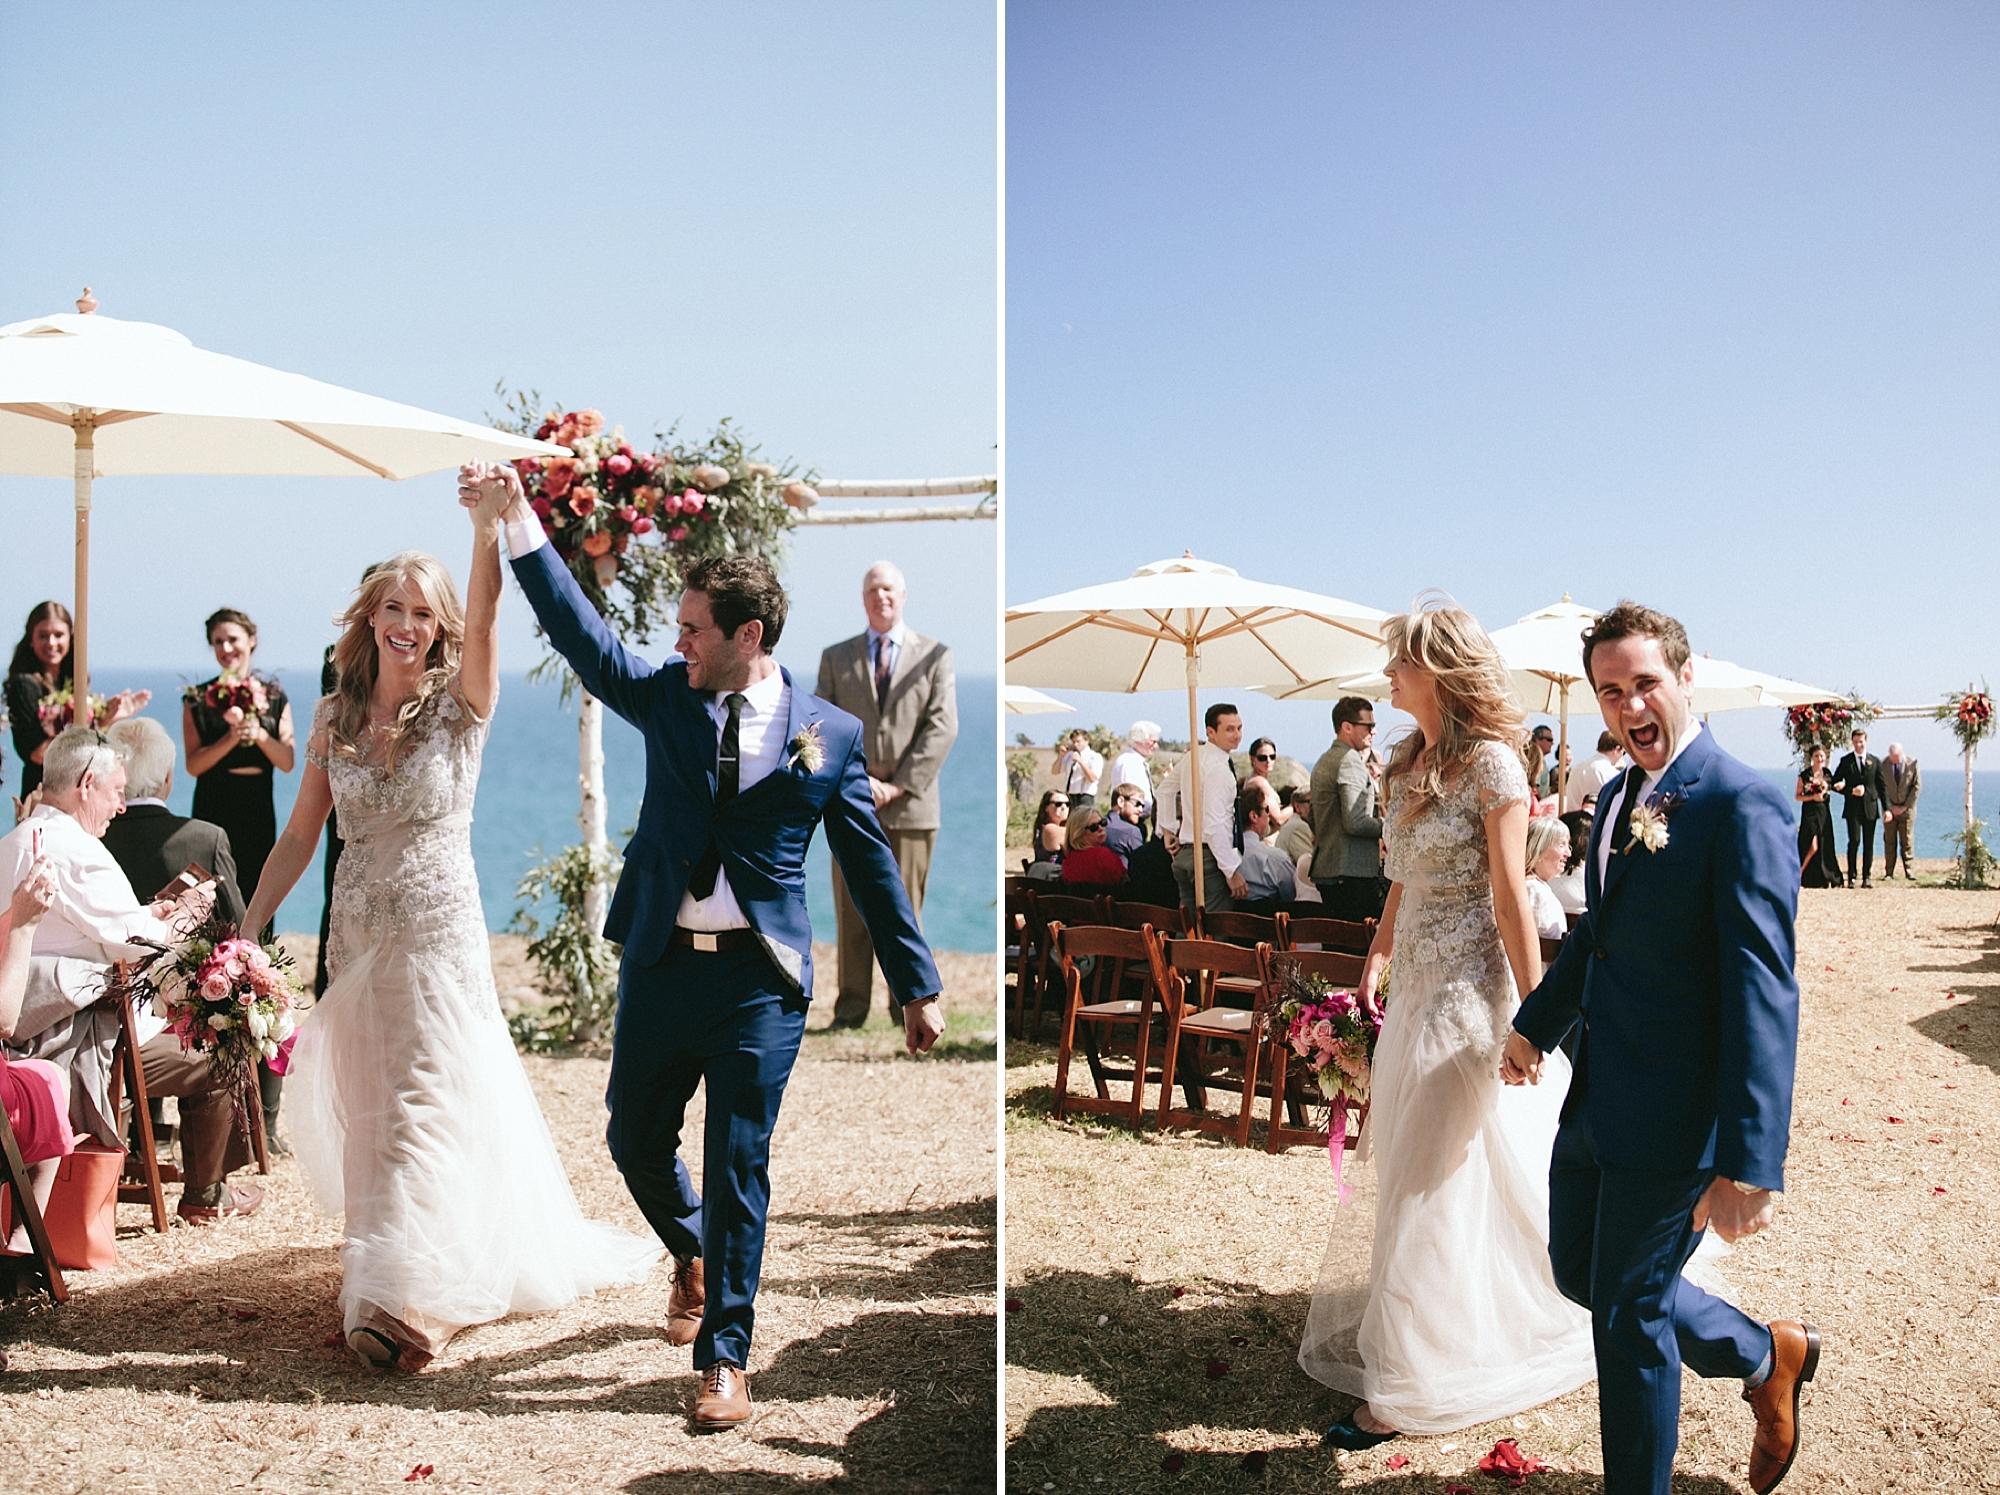 rancho-dos-pueblos-wedding-los-angeles-wedding-photographers-megan-andrew-woodnote-1102.jpg